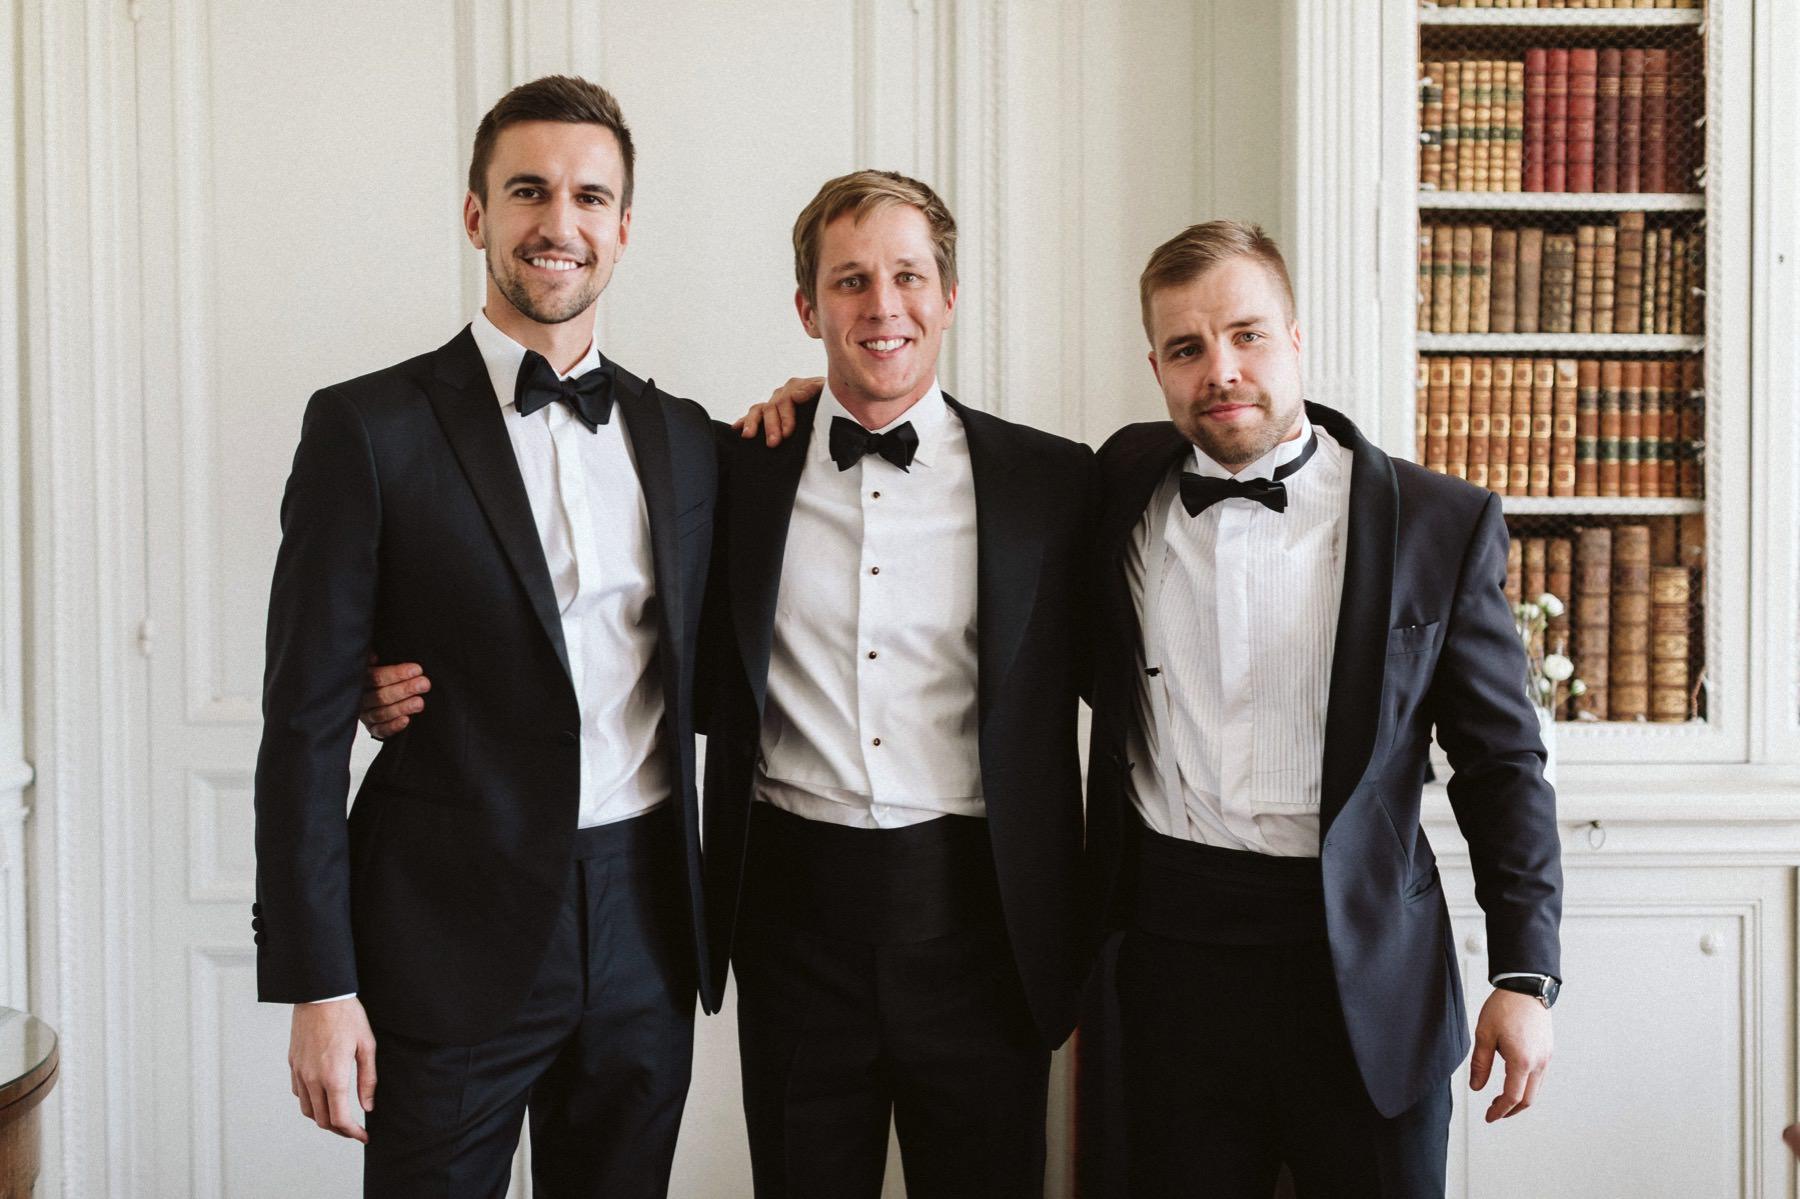 groomsmen at wedding in France